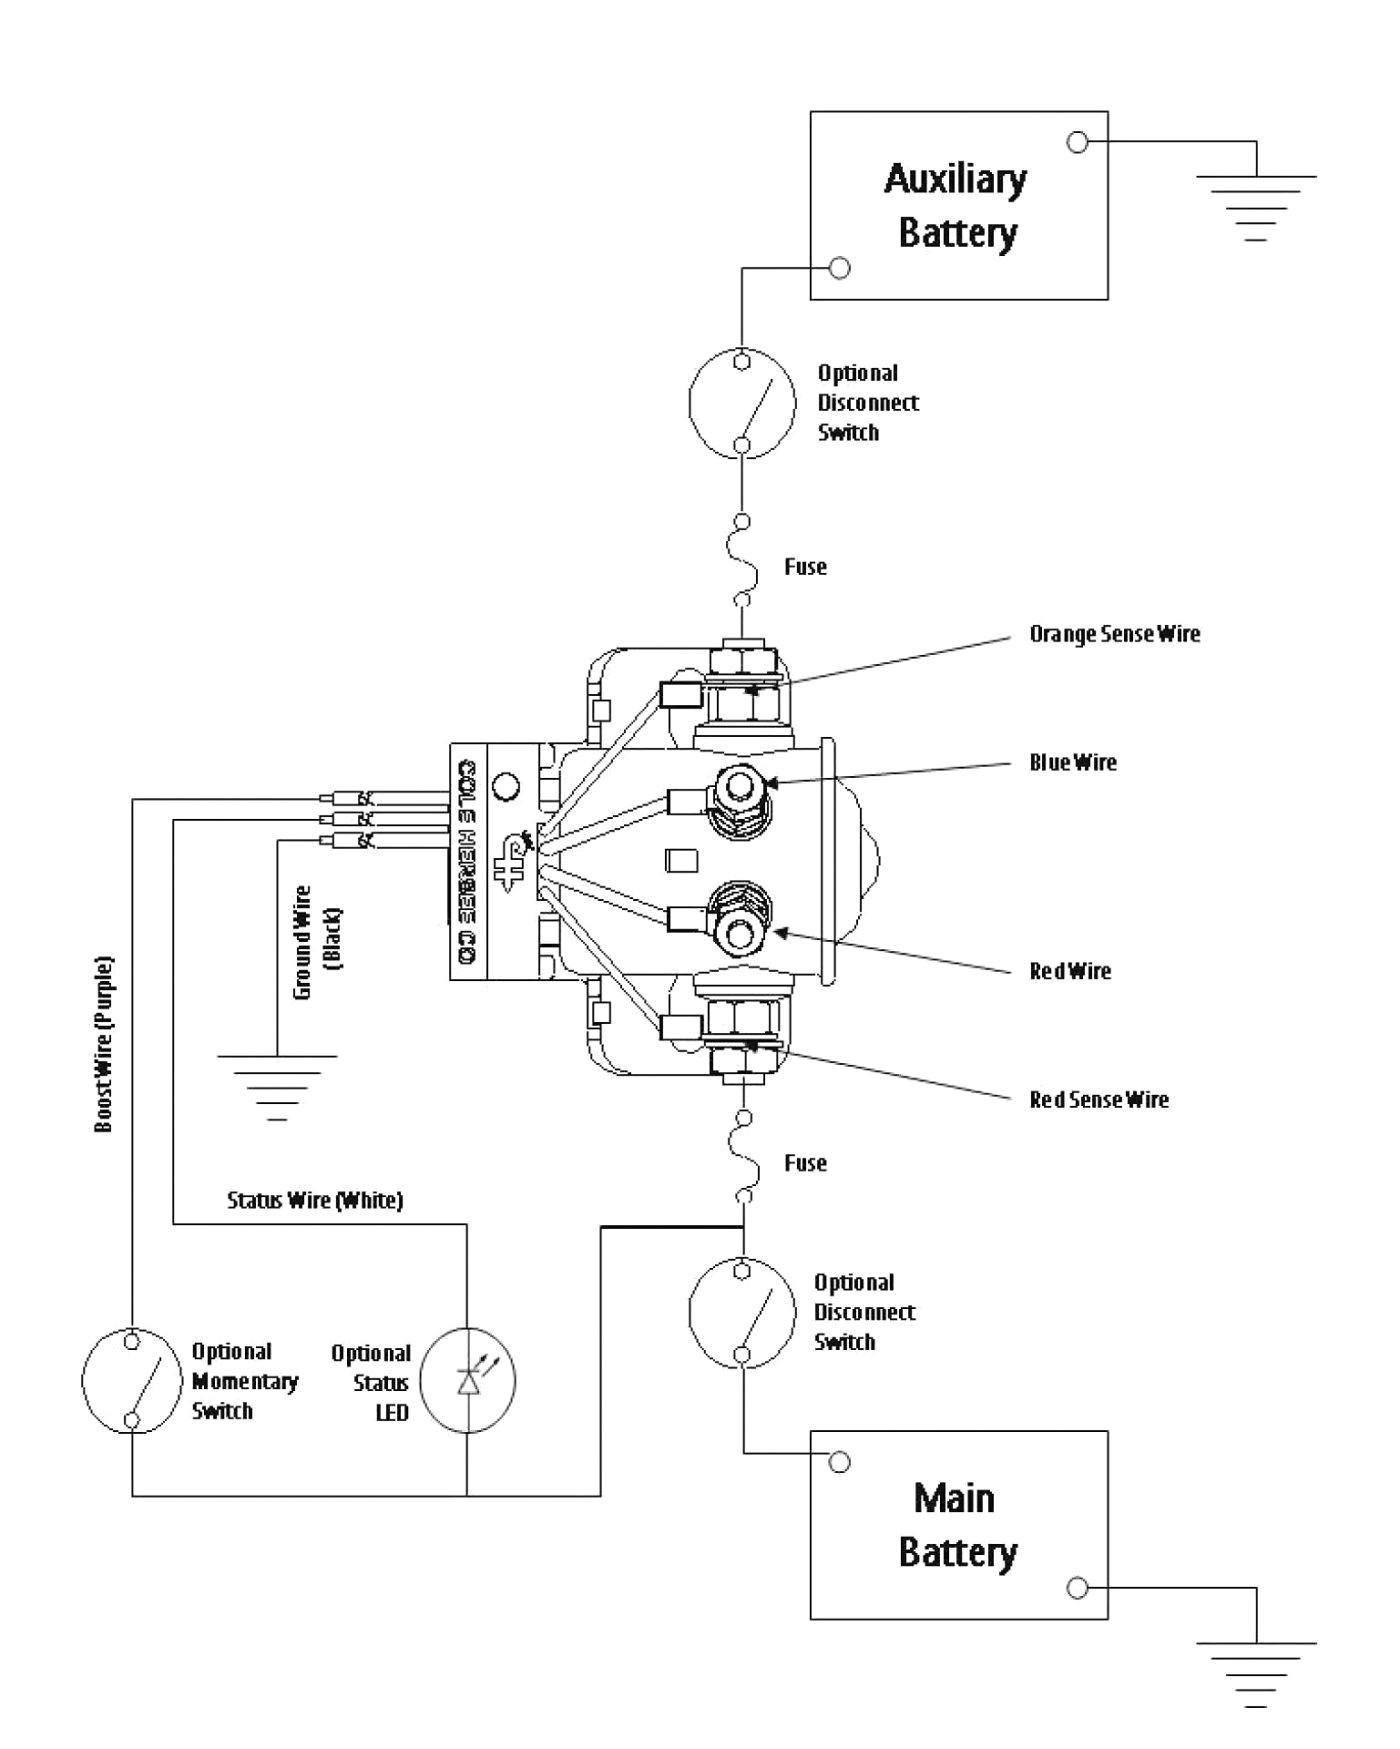 national luna dual battery system wiring diagram luxury national luna dual battery system wiring diagram electrical circuit jpg